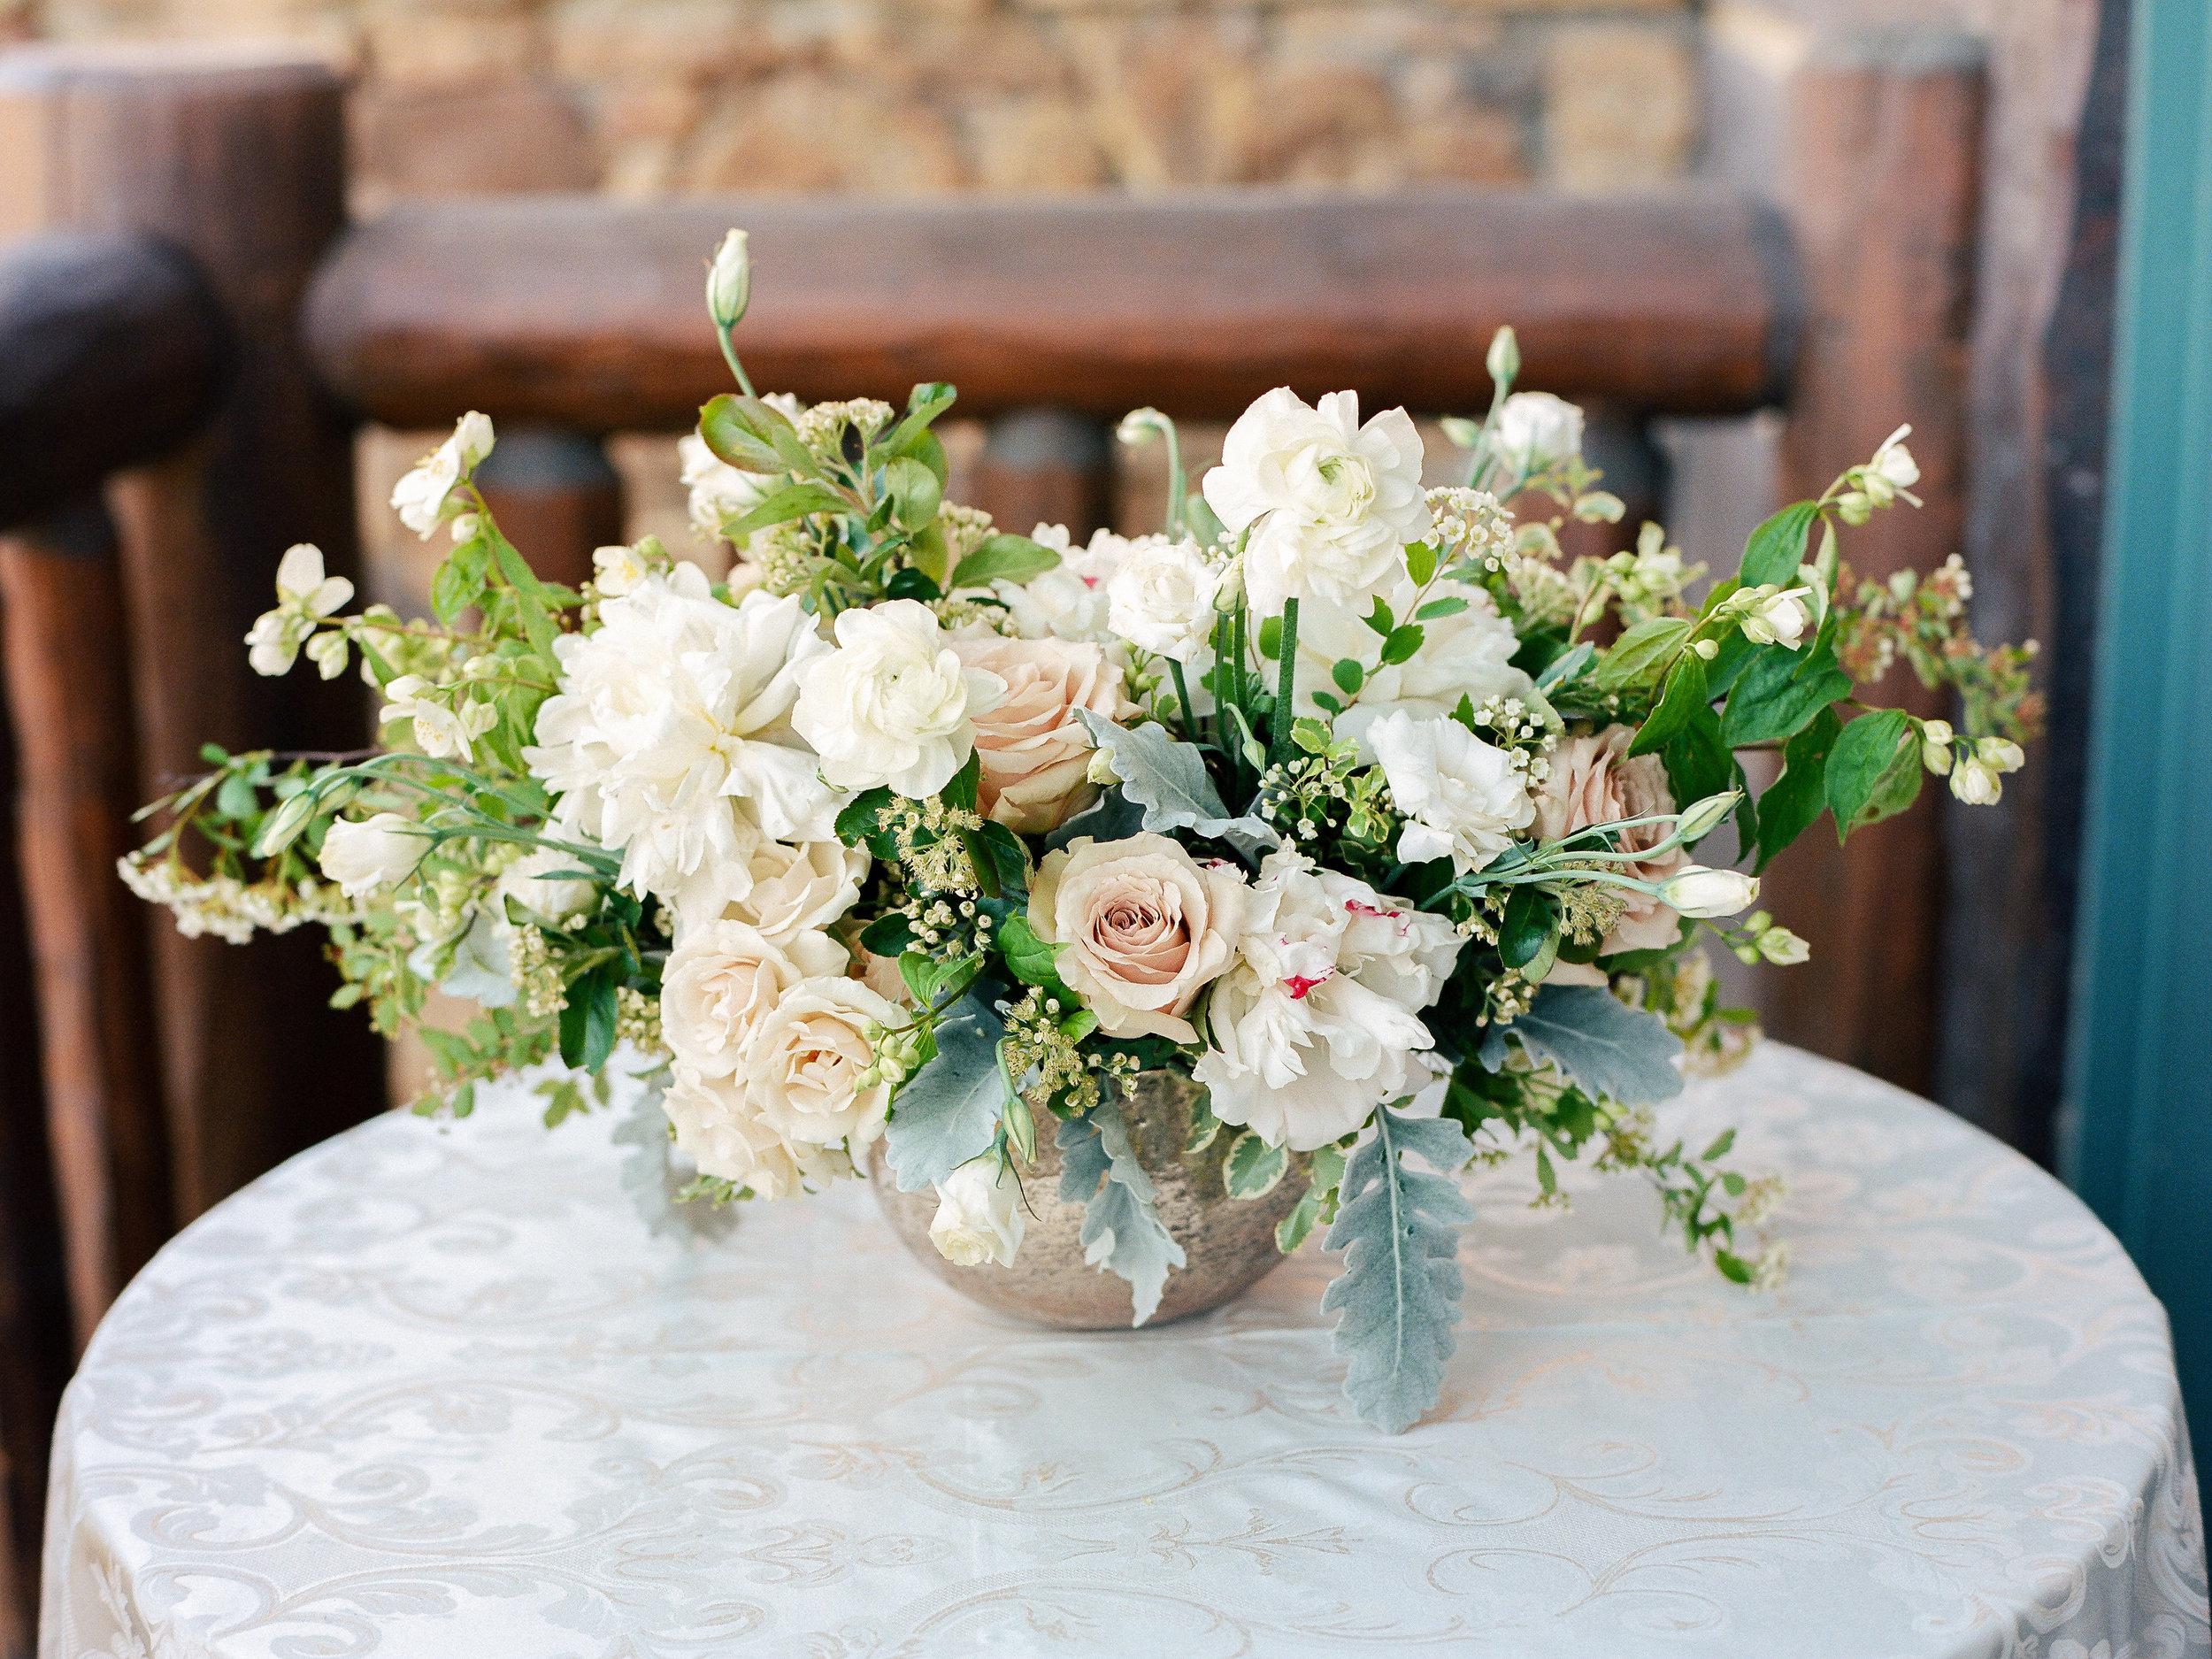 nora-charlie-wedding-details-61.jpg